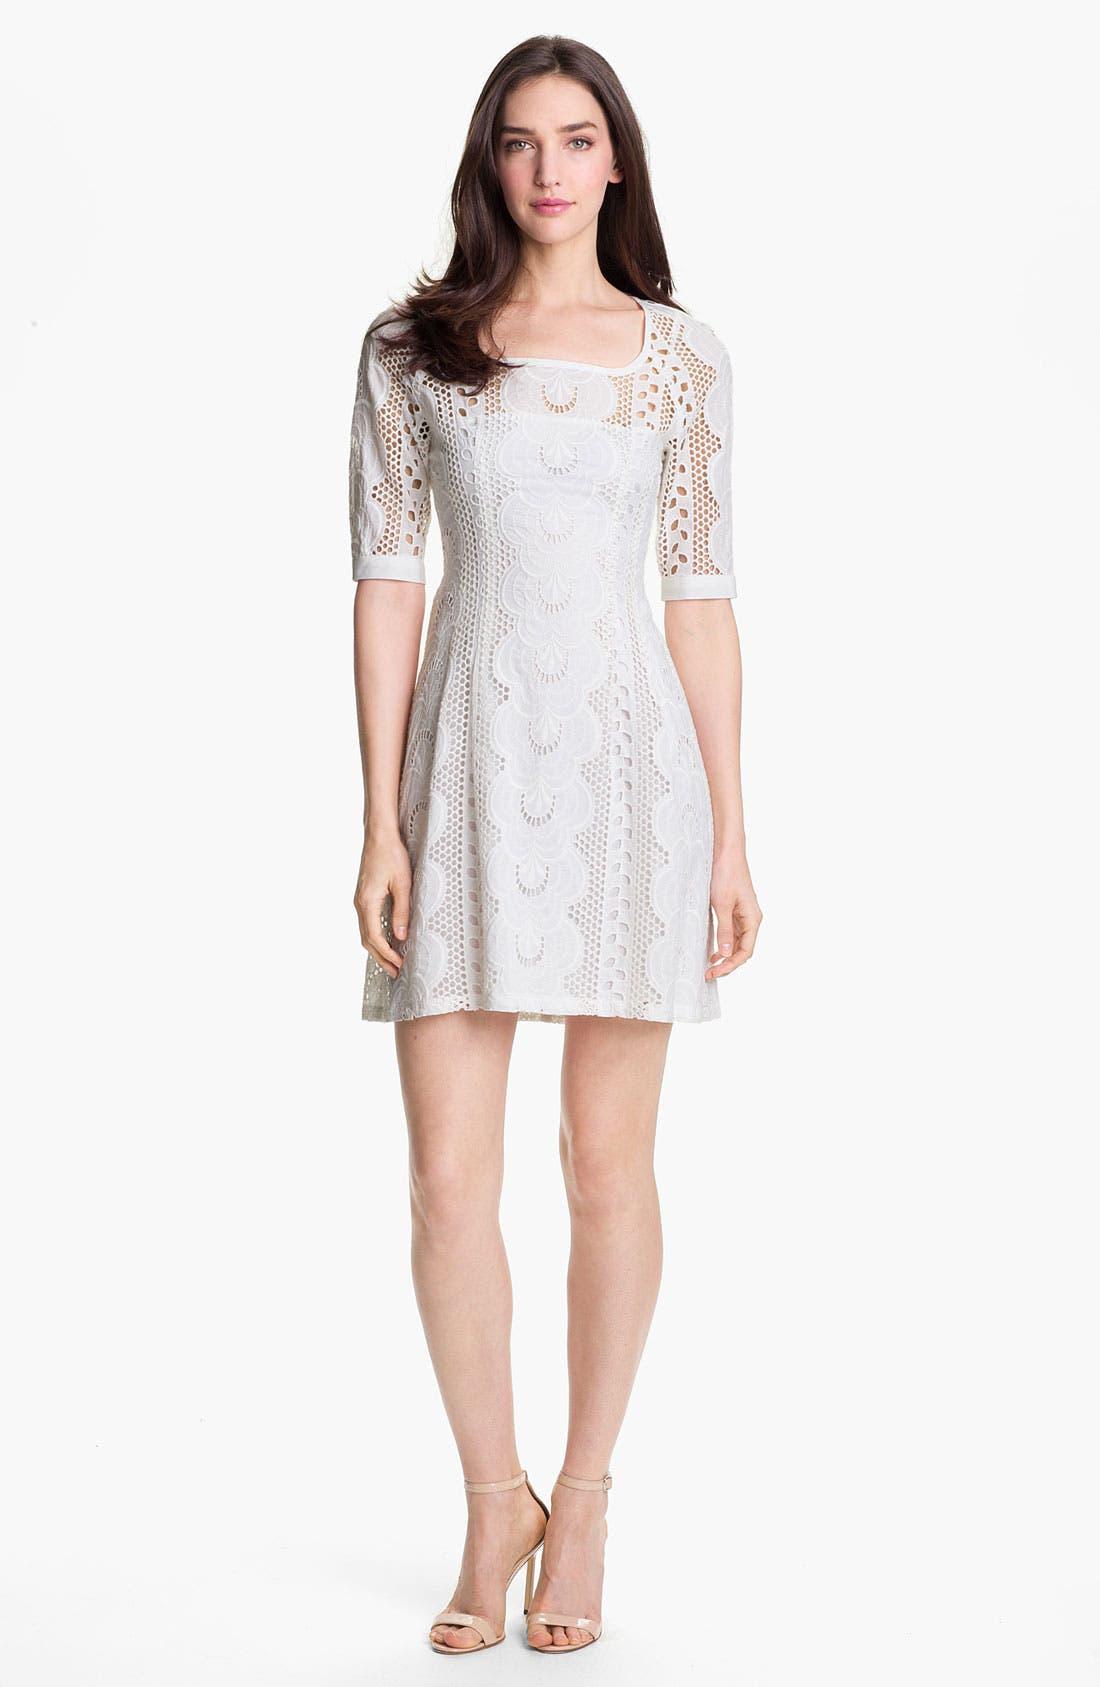 Alternate Image 1 Selected - Nanette Lepore 'Sandy Beach' Cotton A-Line Dress